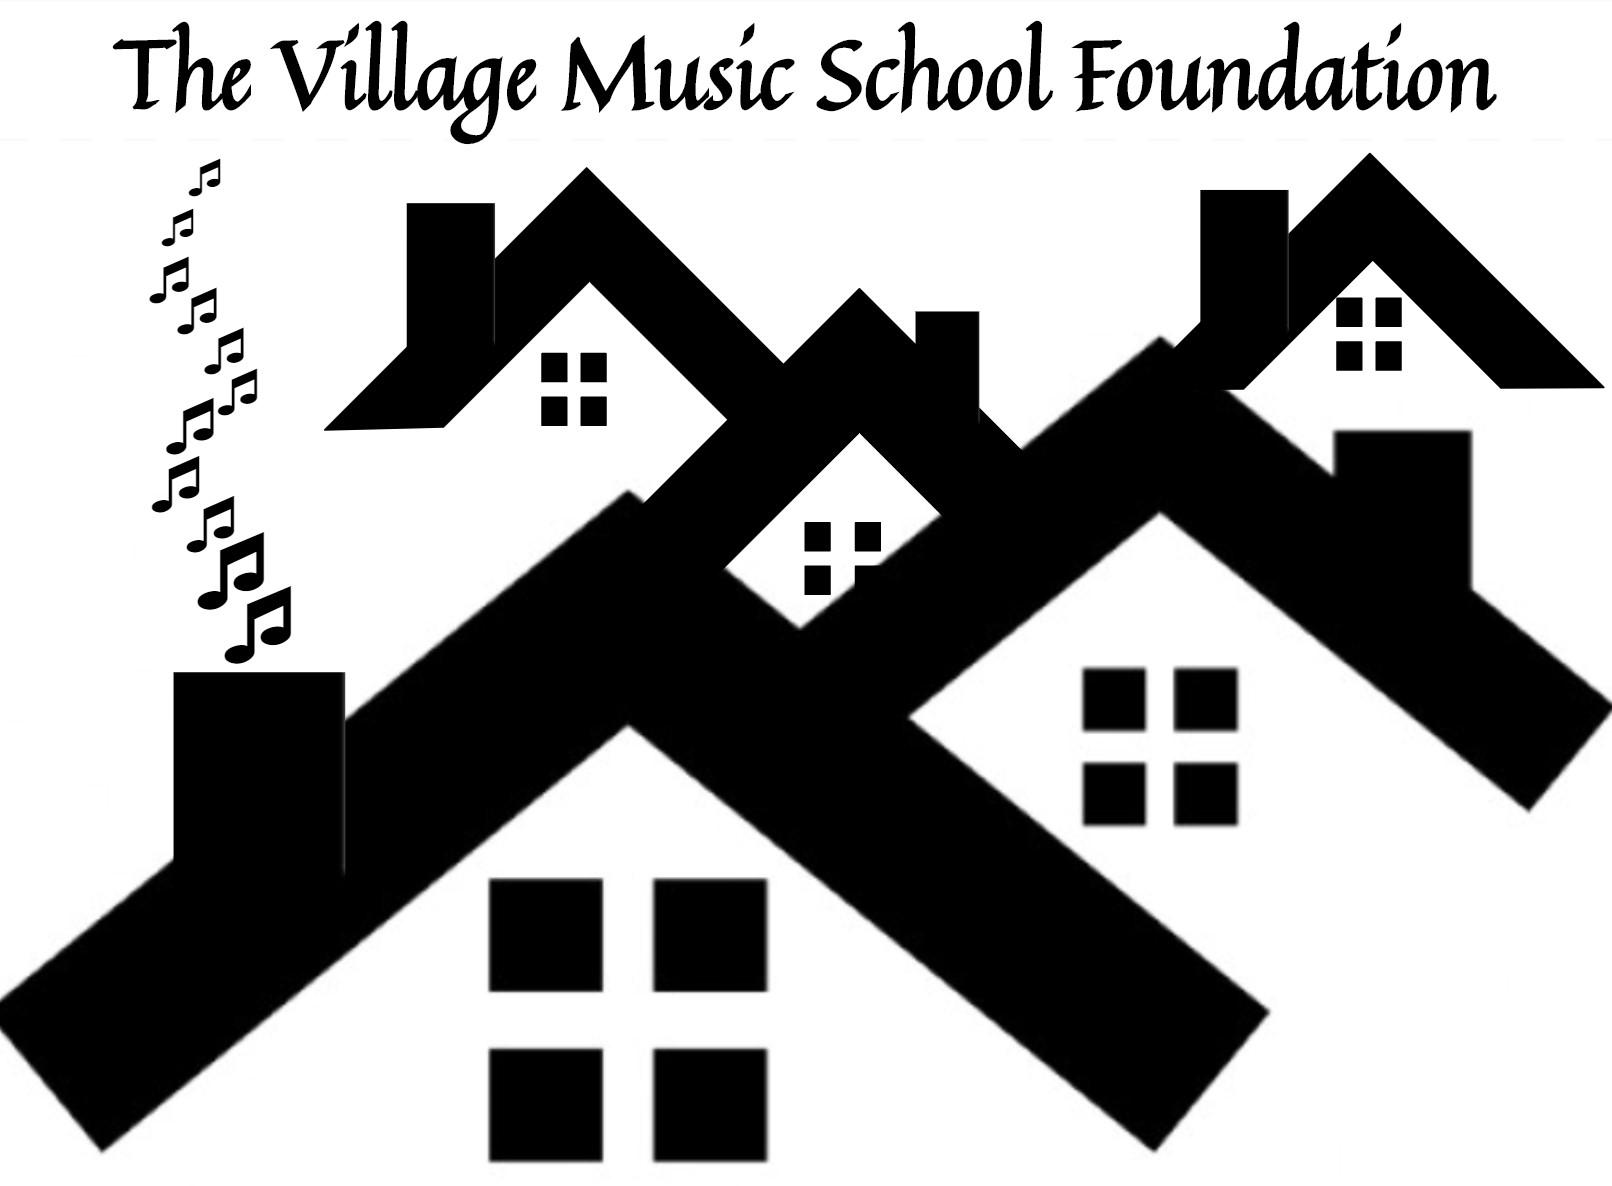 The Village Music School Foundation logo